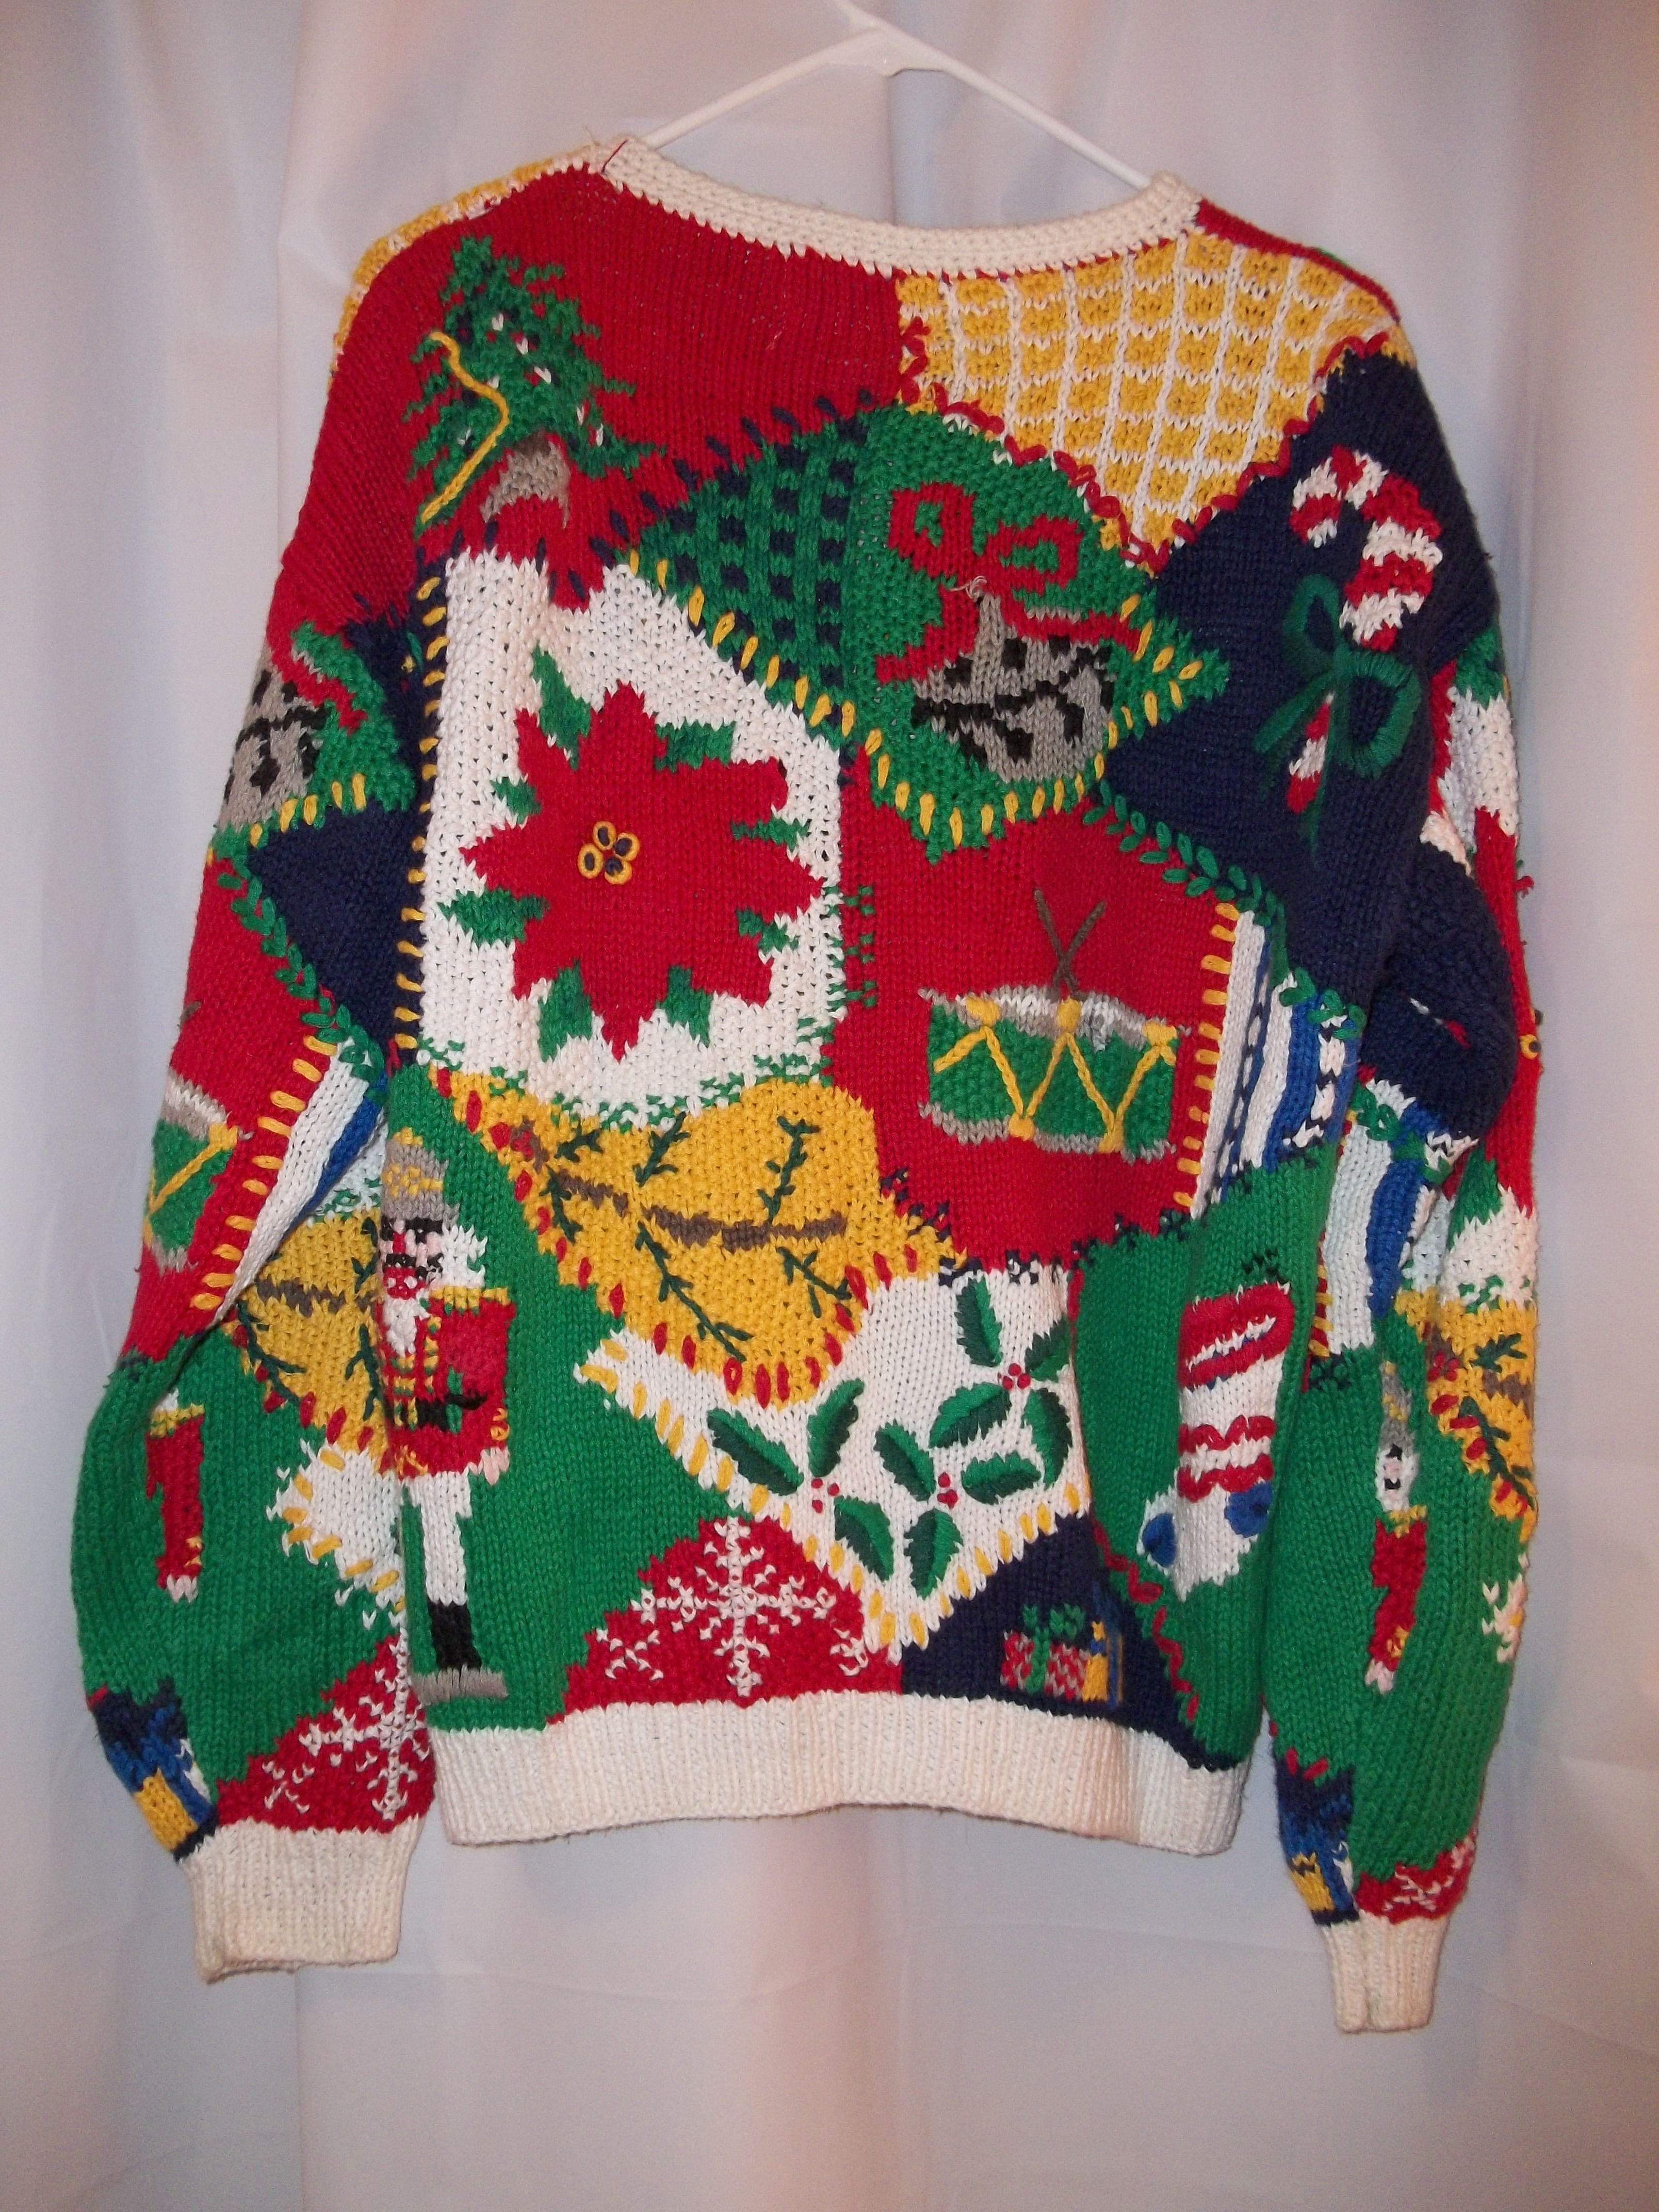 ugly christmas sweater huge selection storesebaycomsomthinspecl - Ugly Christmas Sweater Ebay